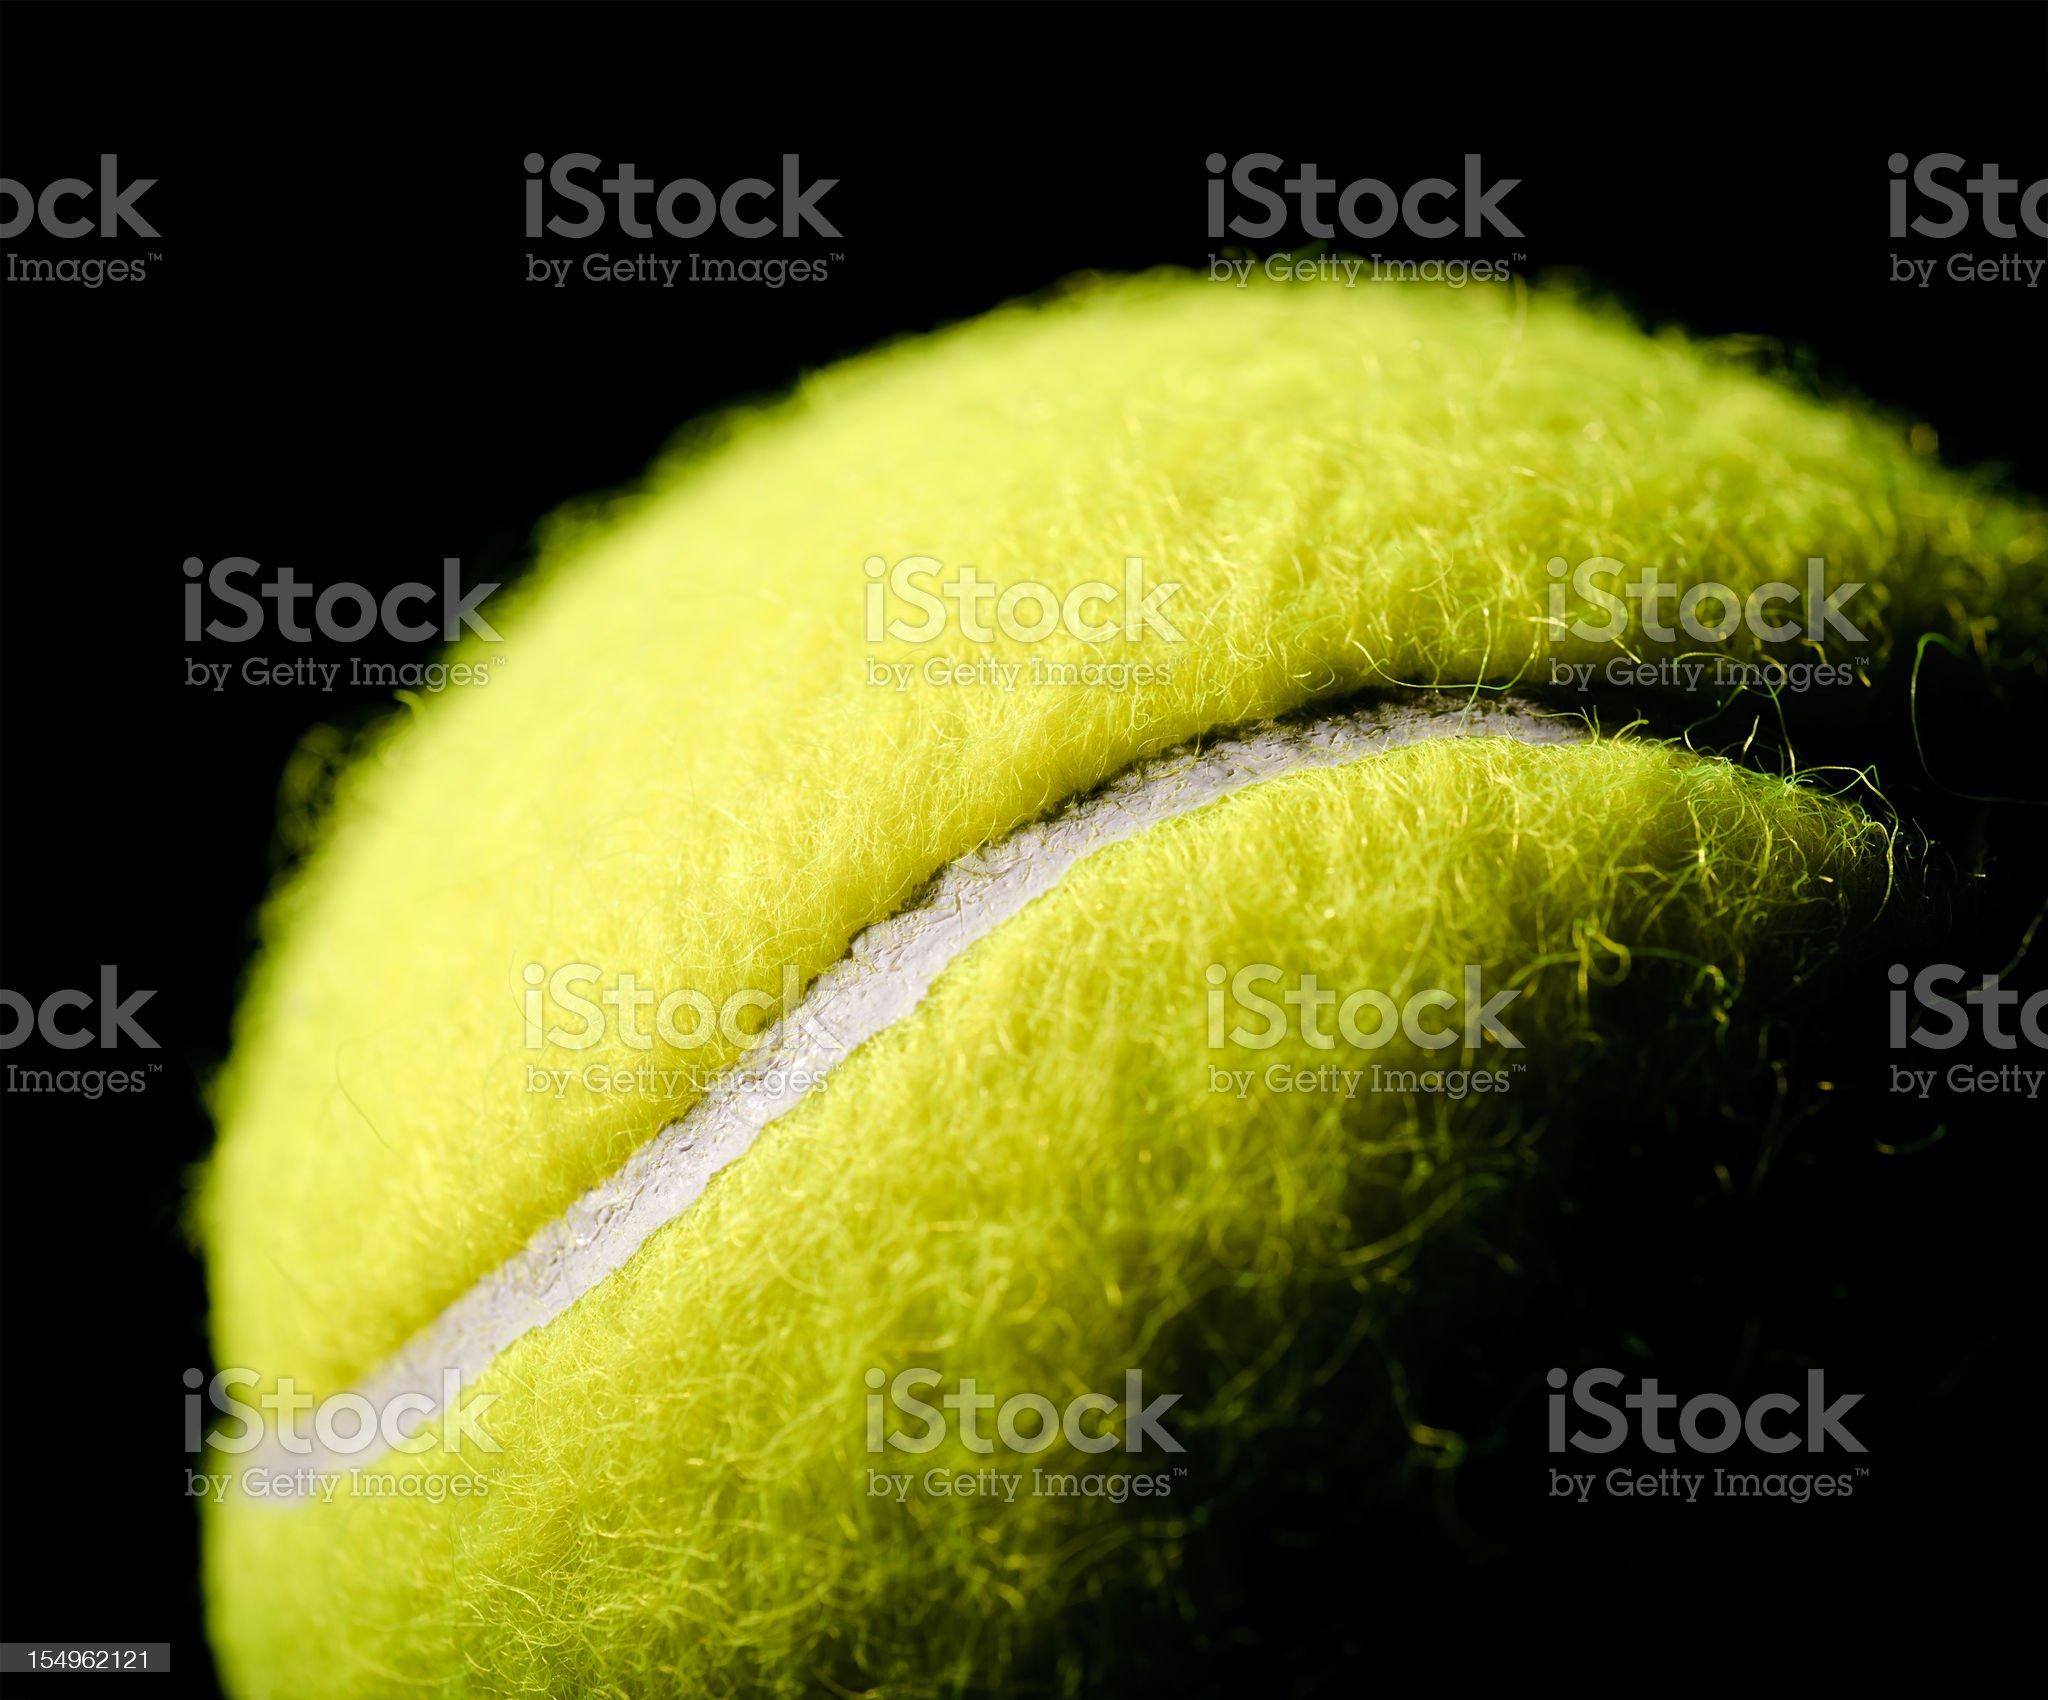 Tennis Ball Macro on Black Background royalty-free stock photo